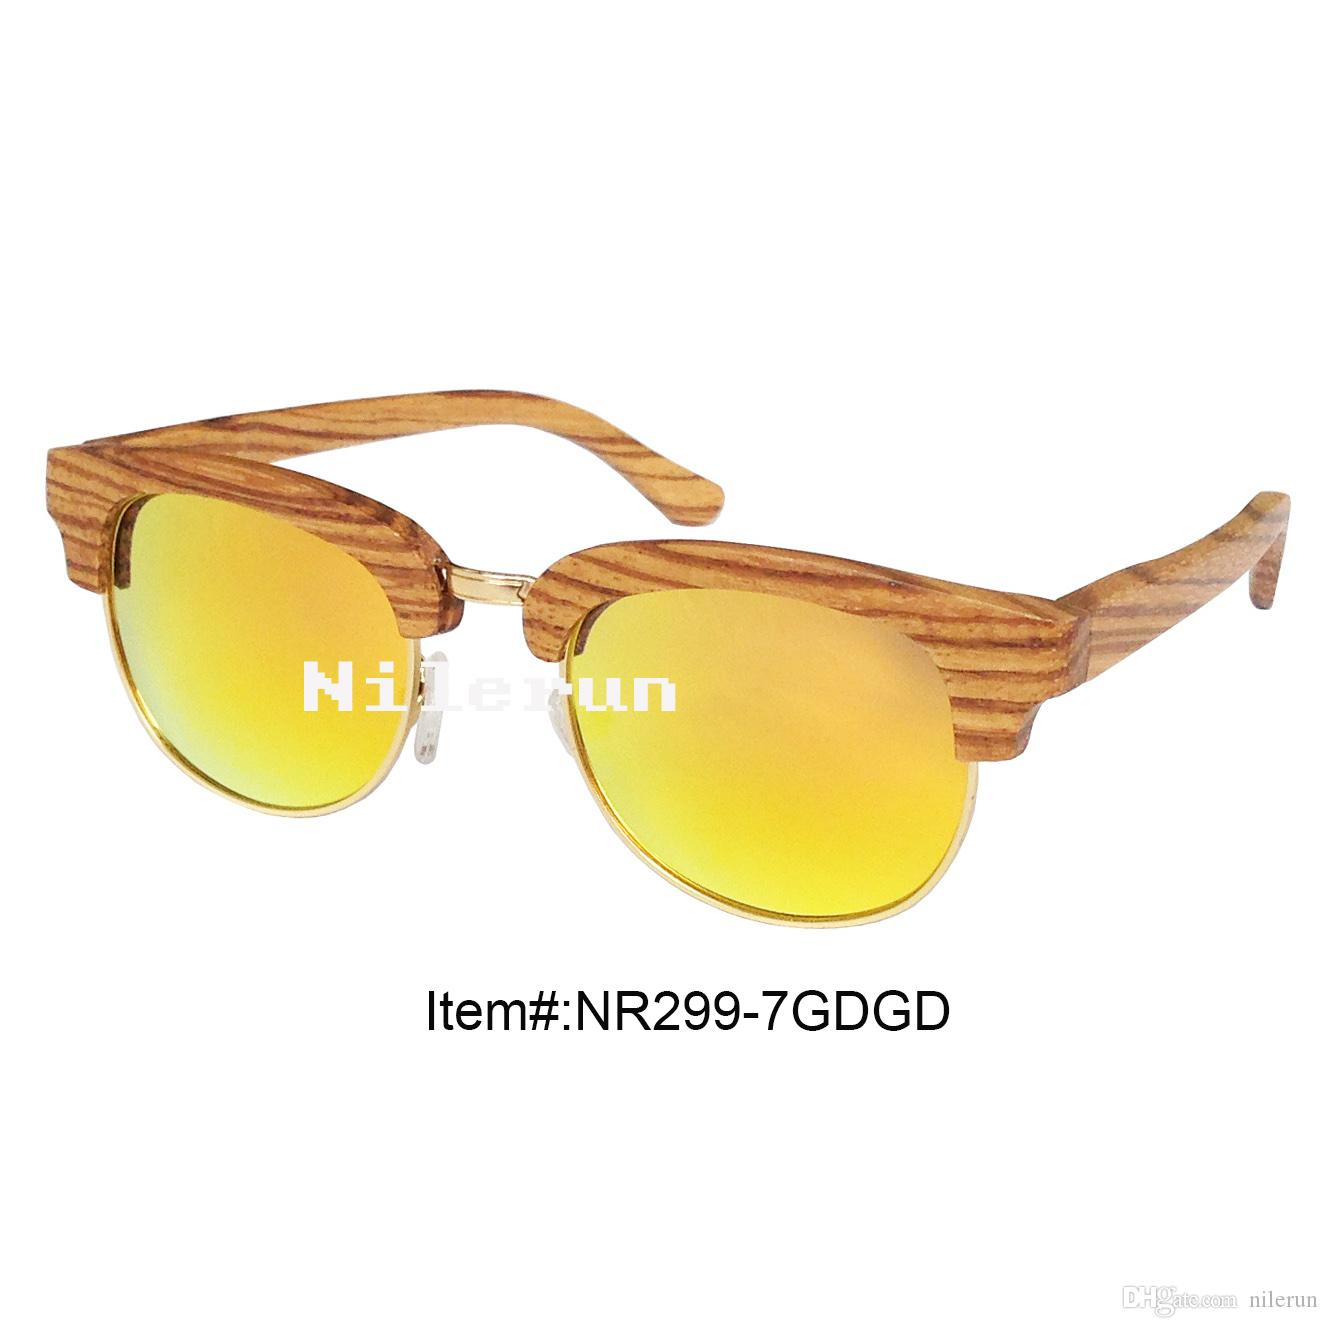 5eb5ff9ff8 Cheap Oversized Round Metal Sunglasses Best Polarized Metal Sunglasses